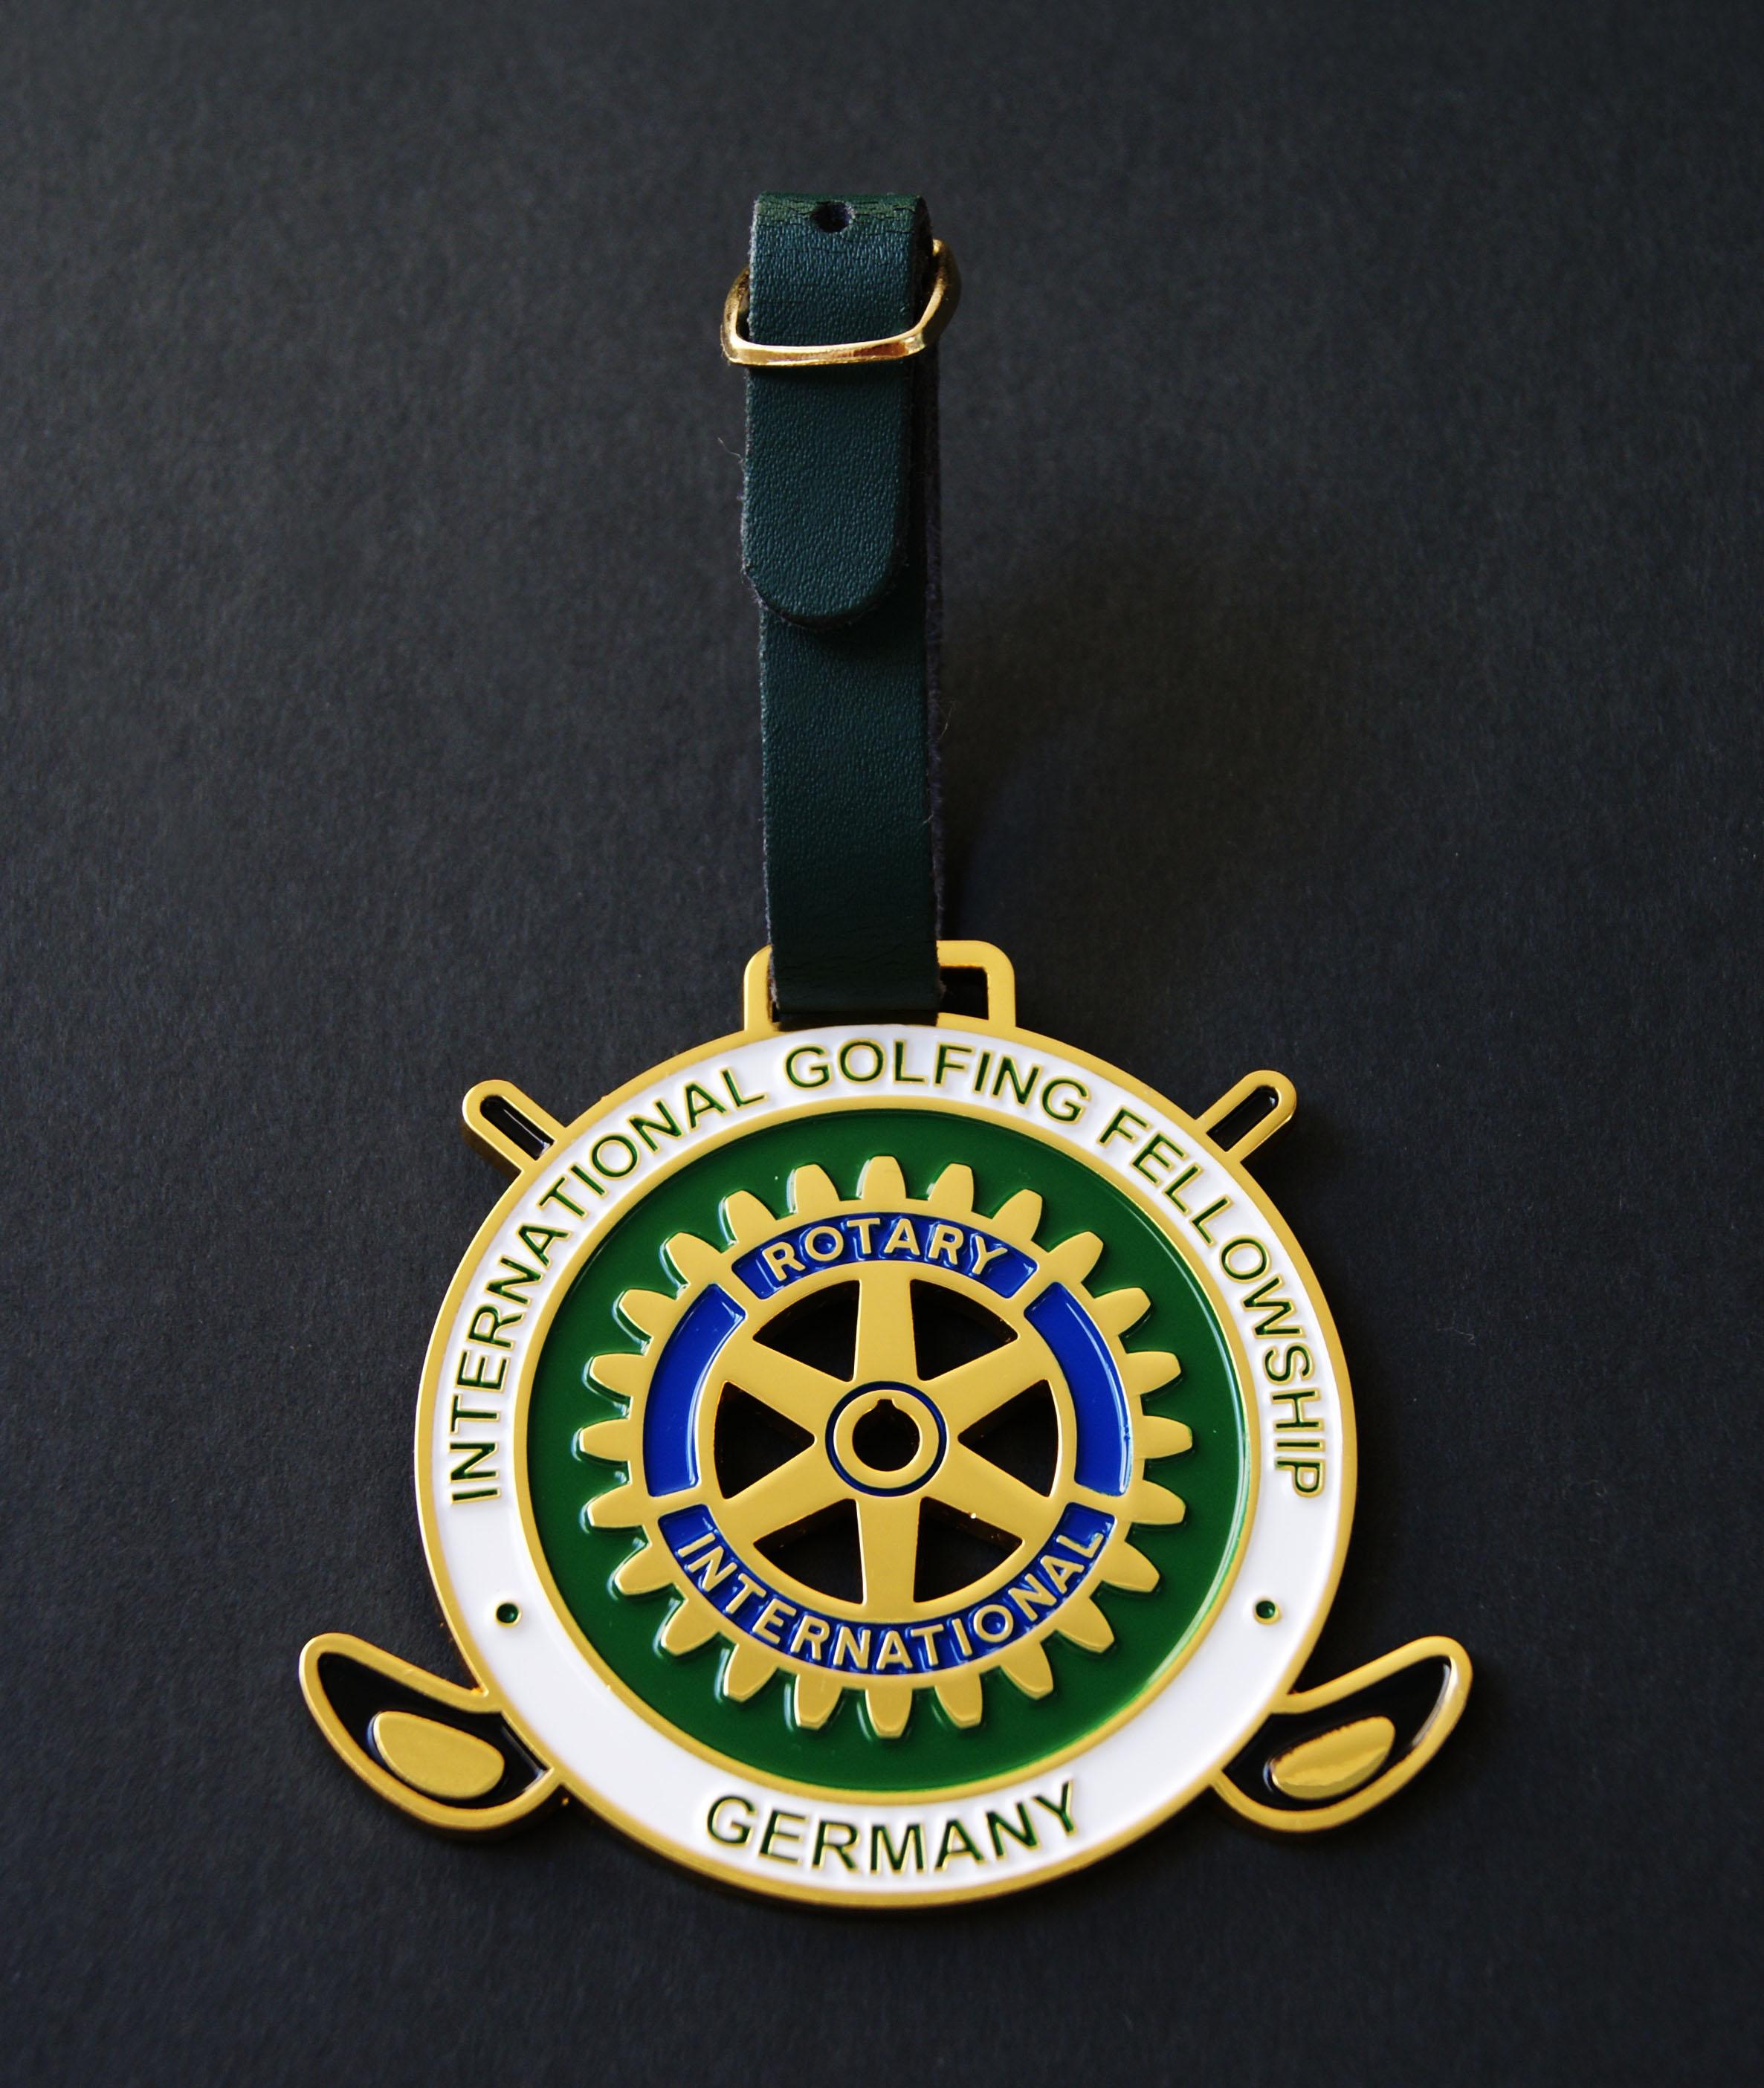 Rotary International Golftag 2017